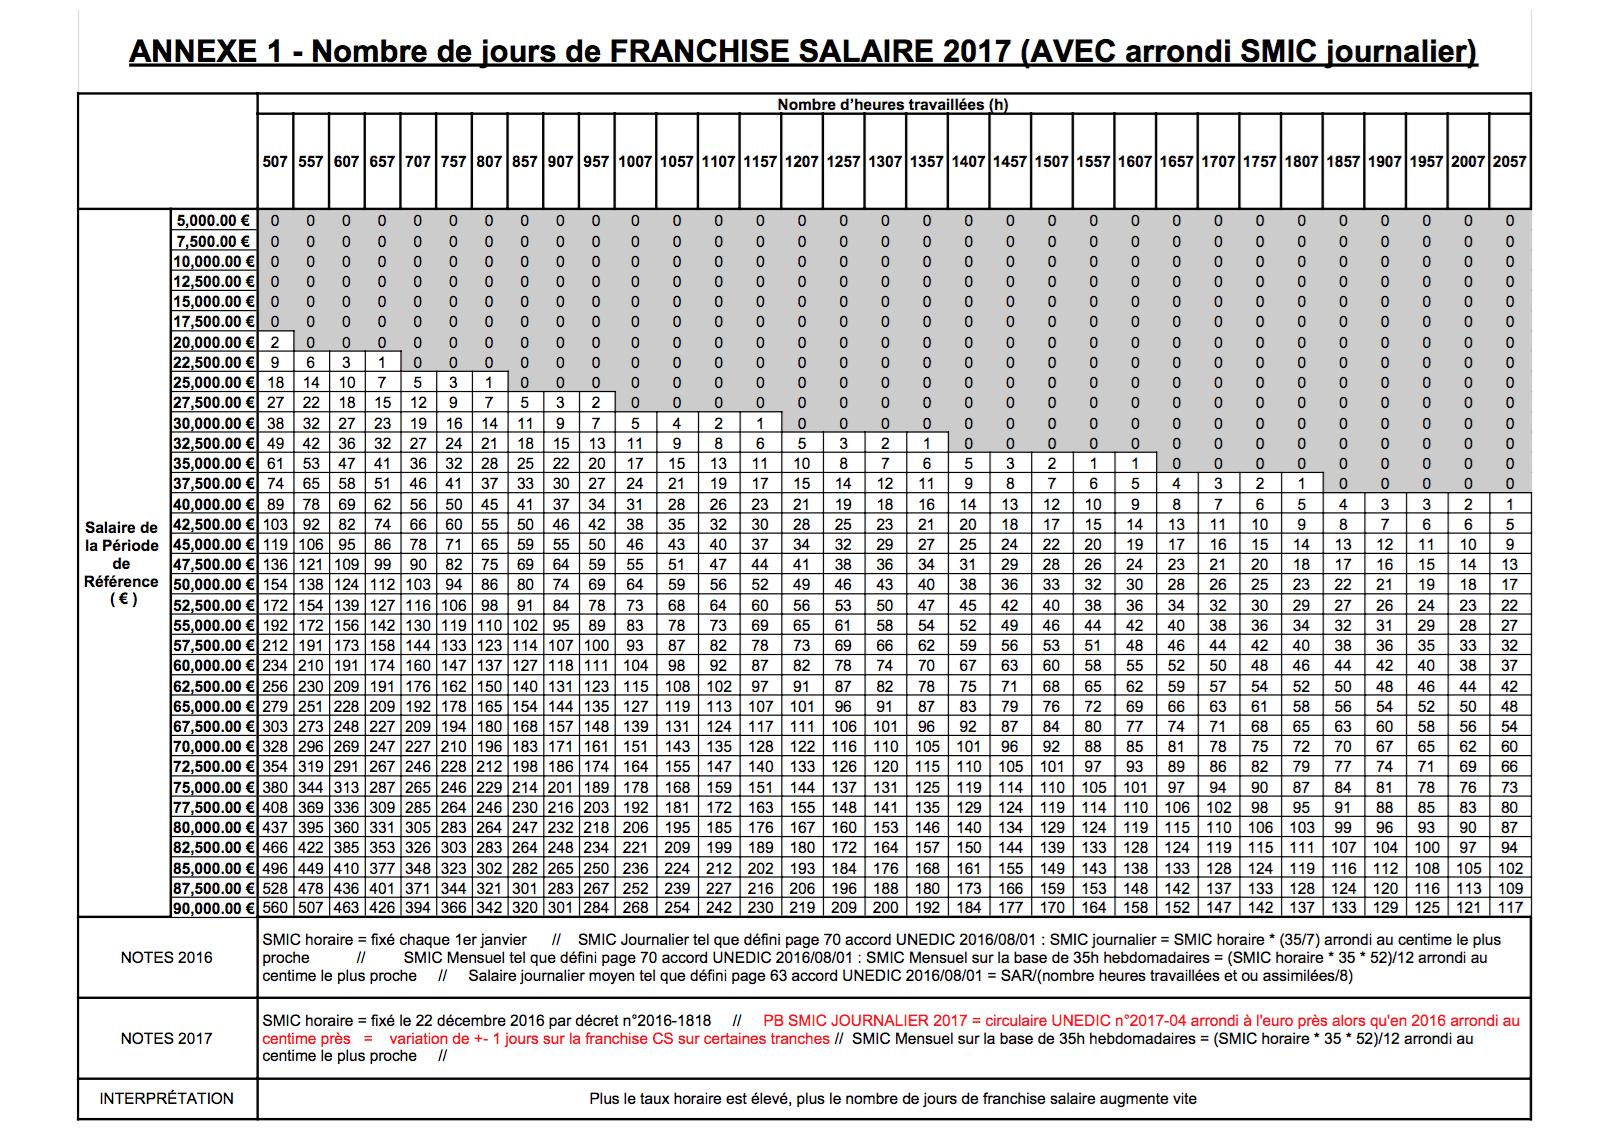 Annexe 1 - Franchise Salaire 2017